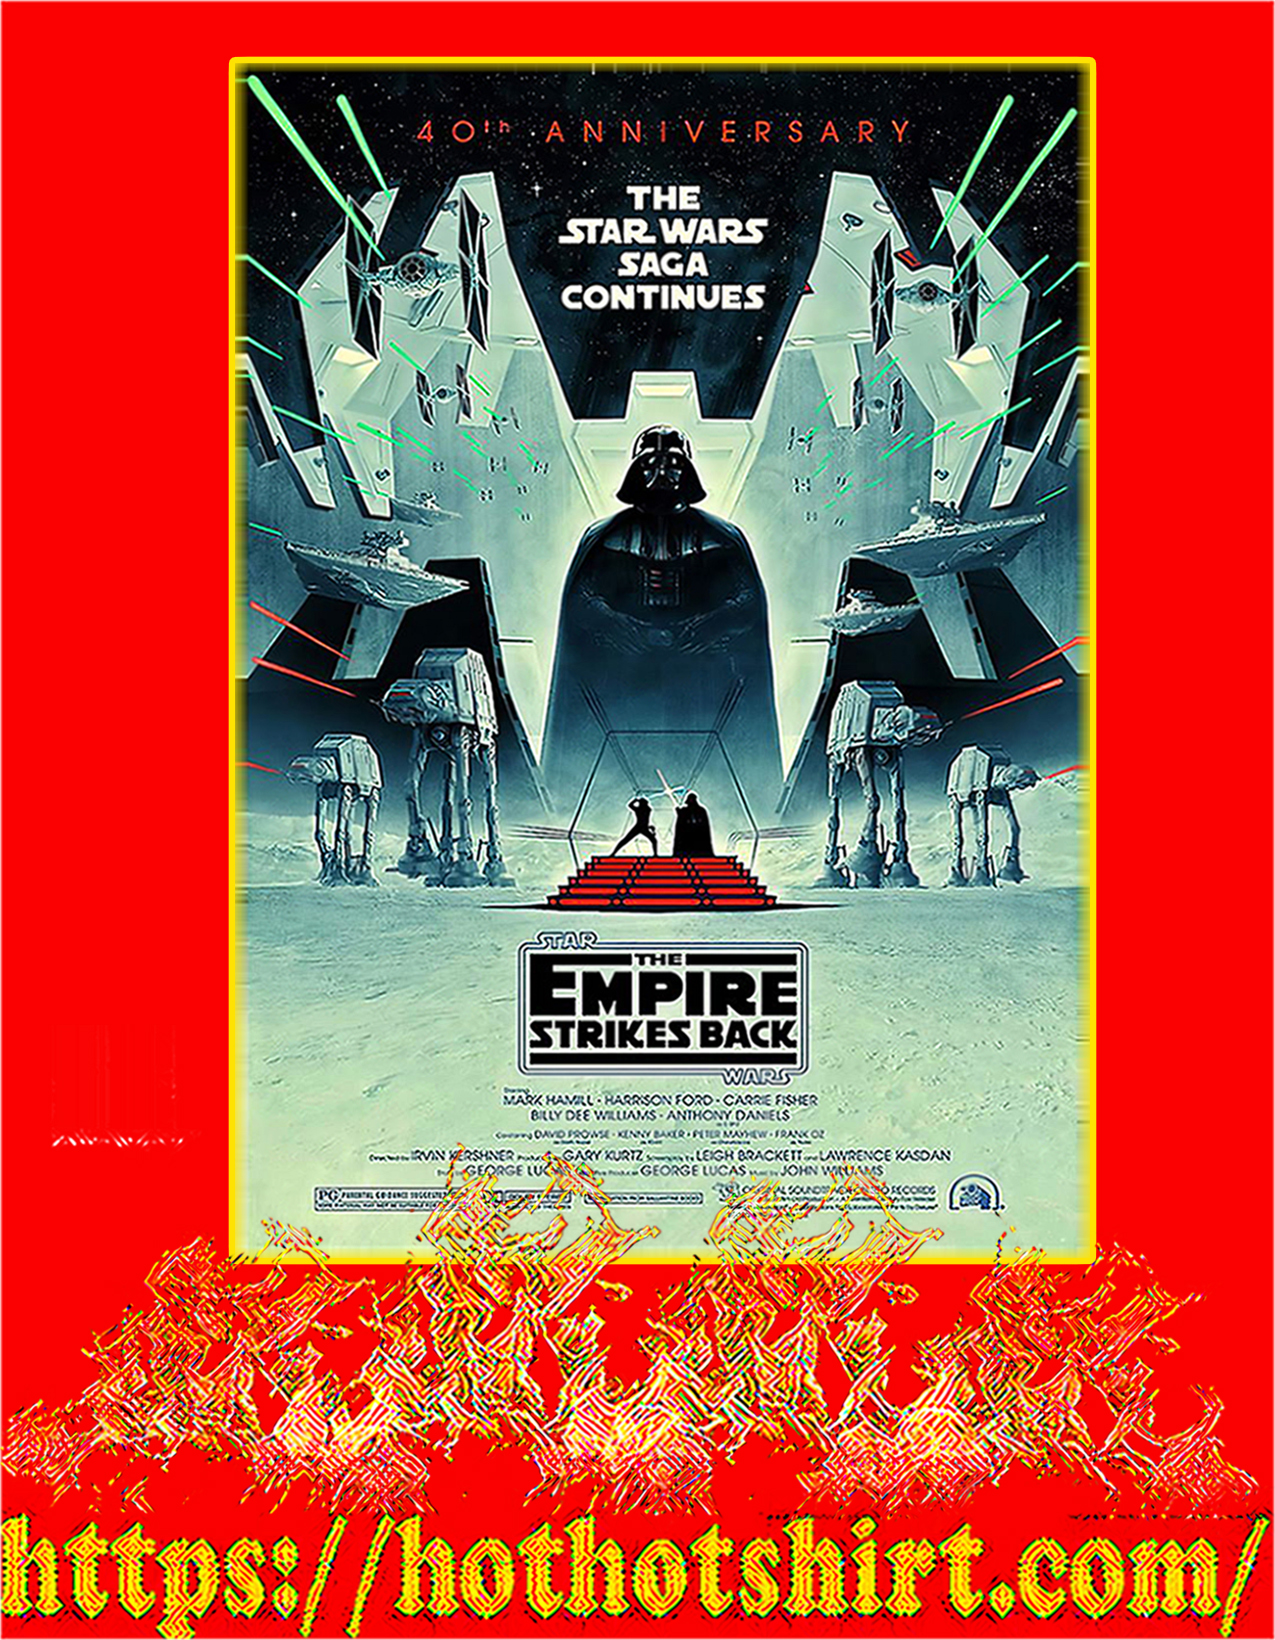 The star wars saga continues 40th anniversary poster - A3